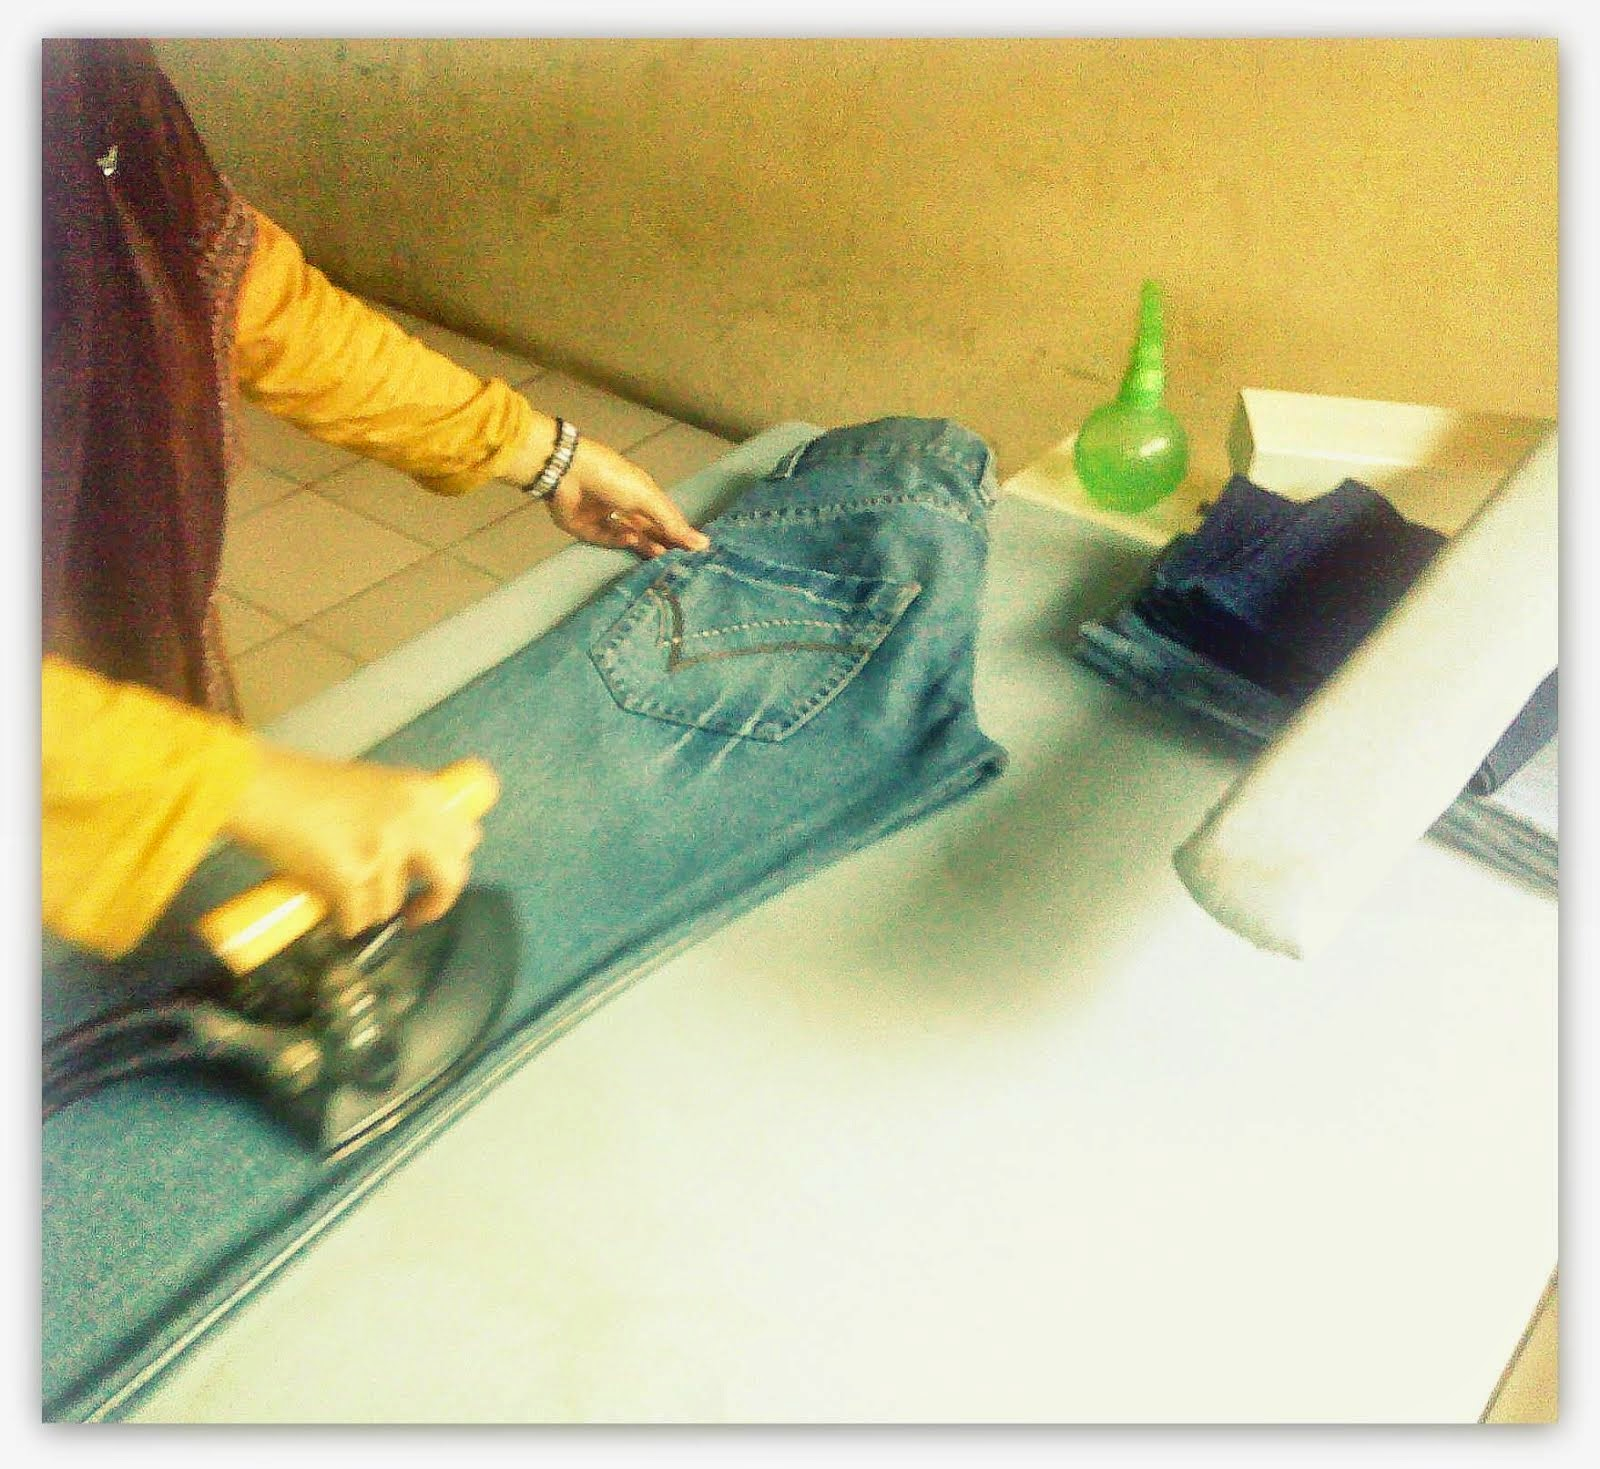 Ironing Process